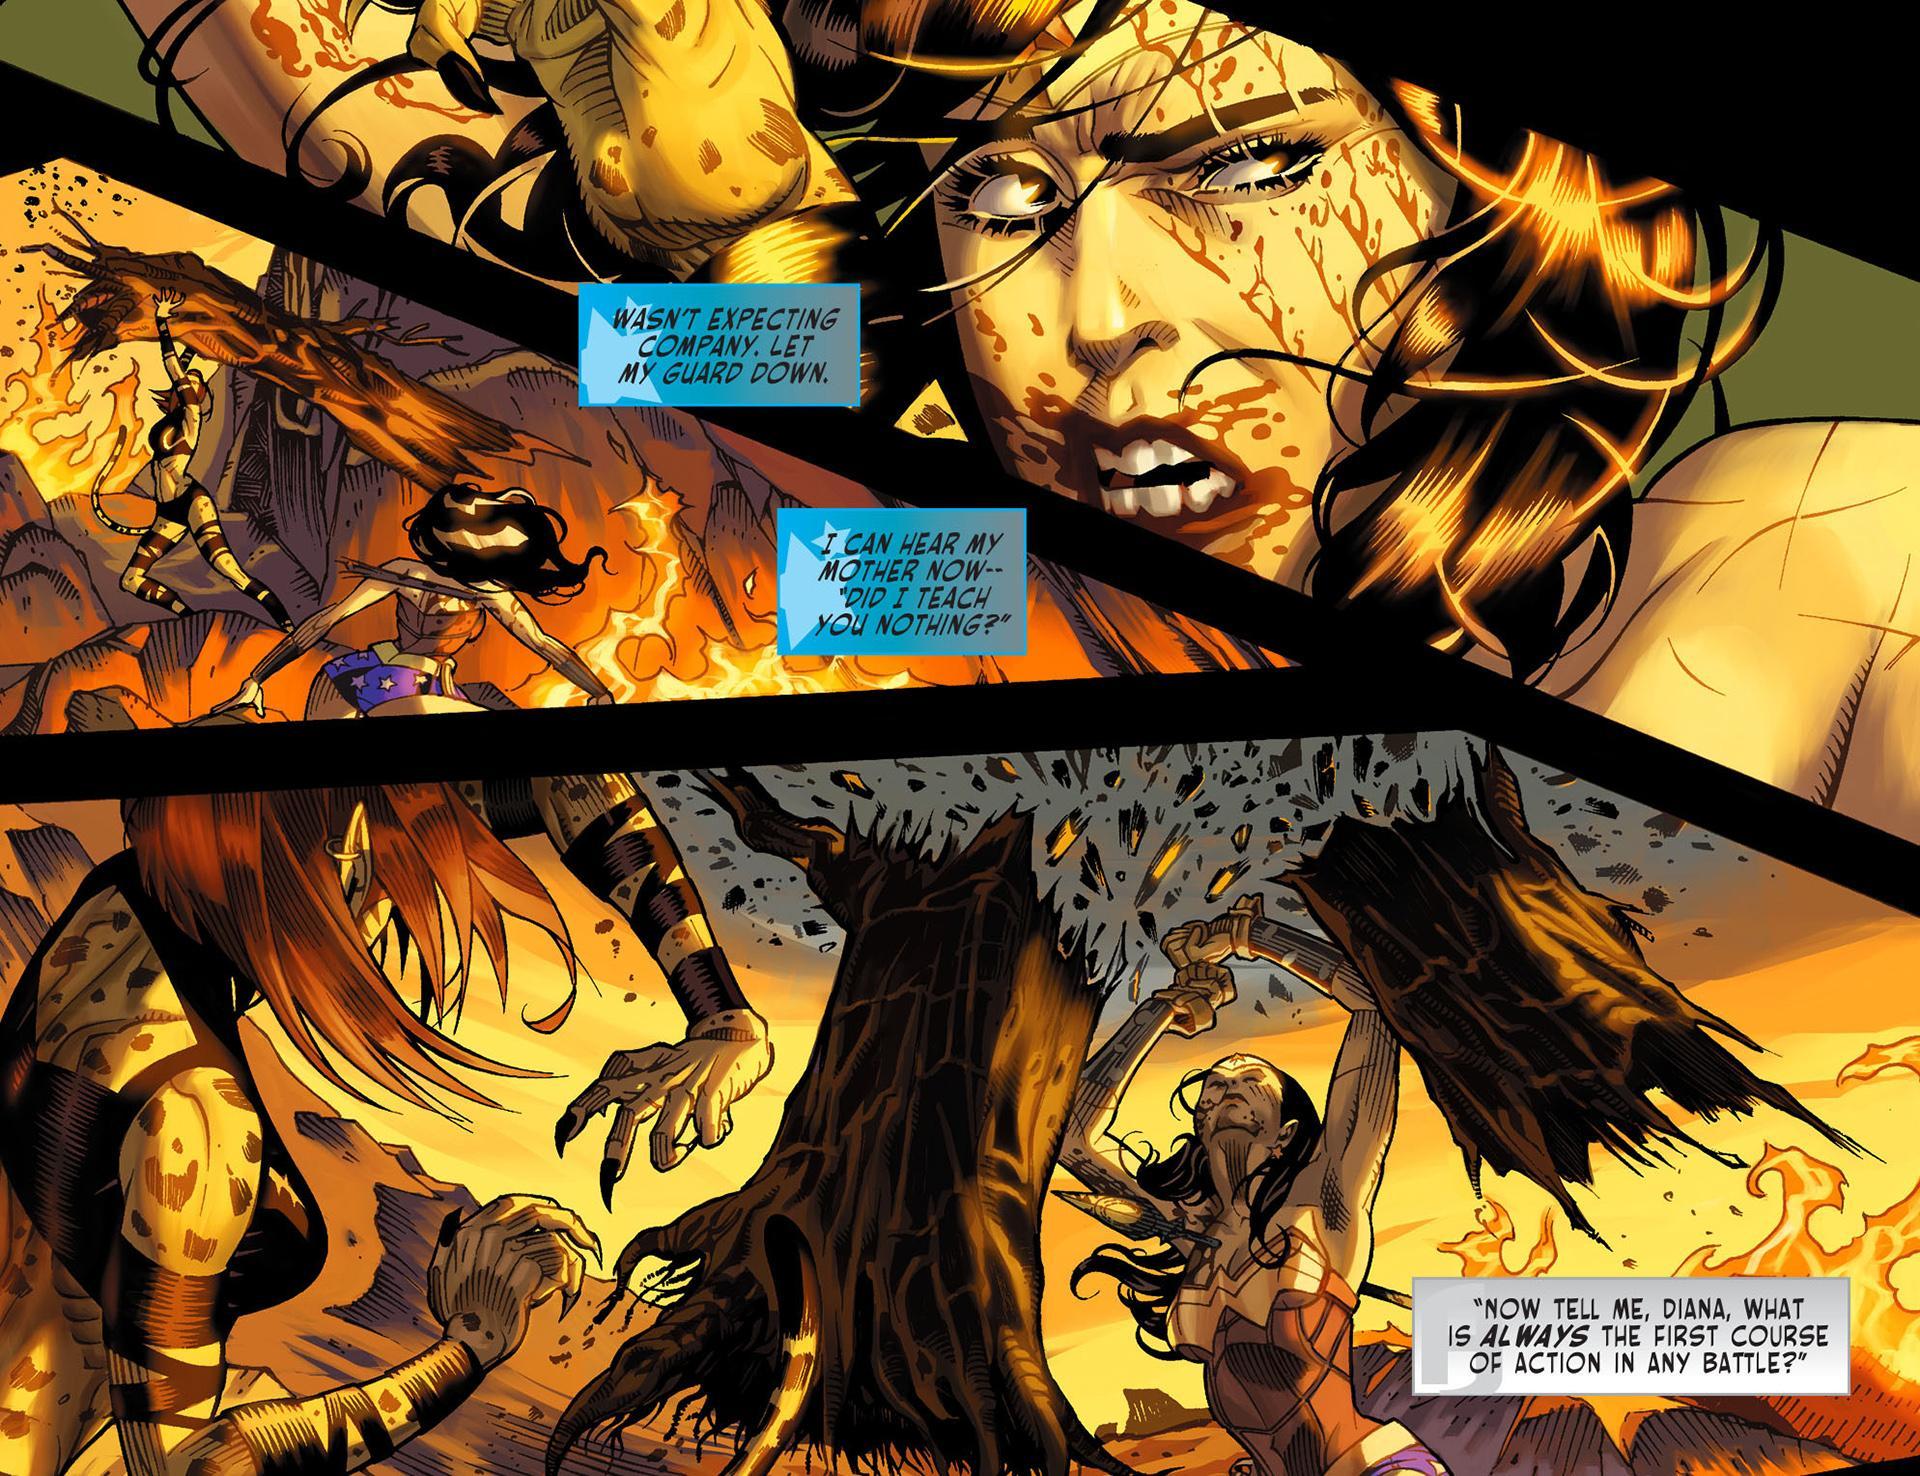 Sensation Comics featuring Wonder Woman 2 review